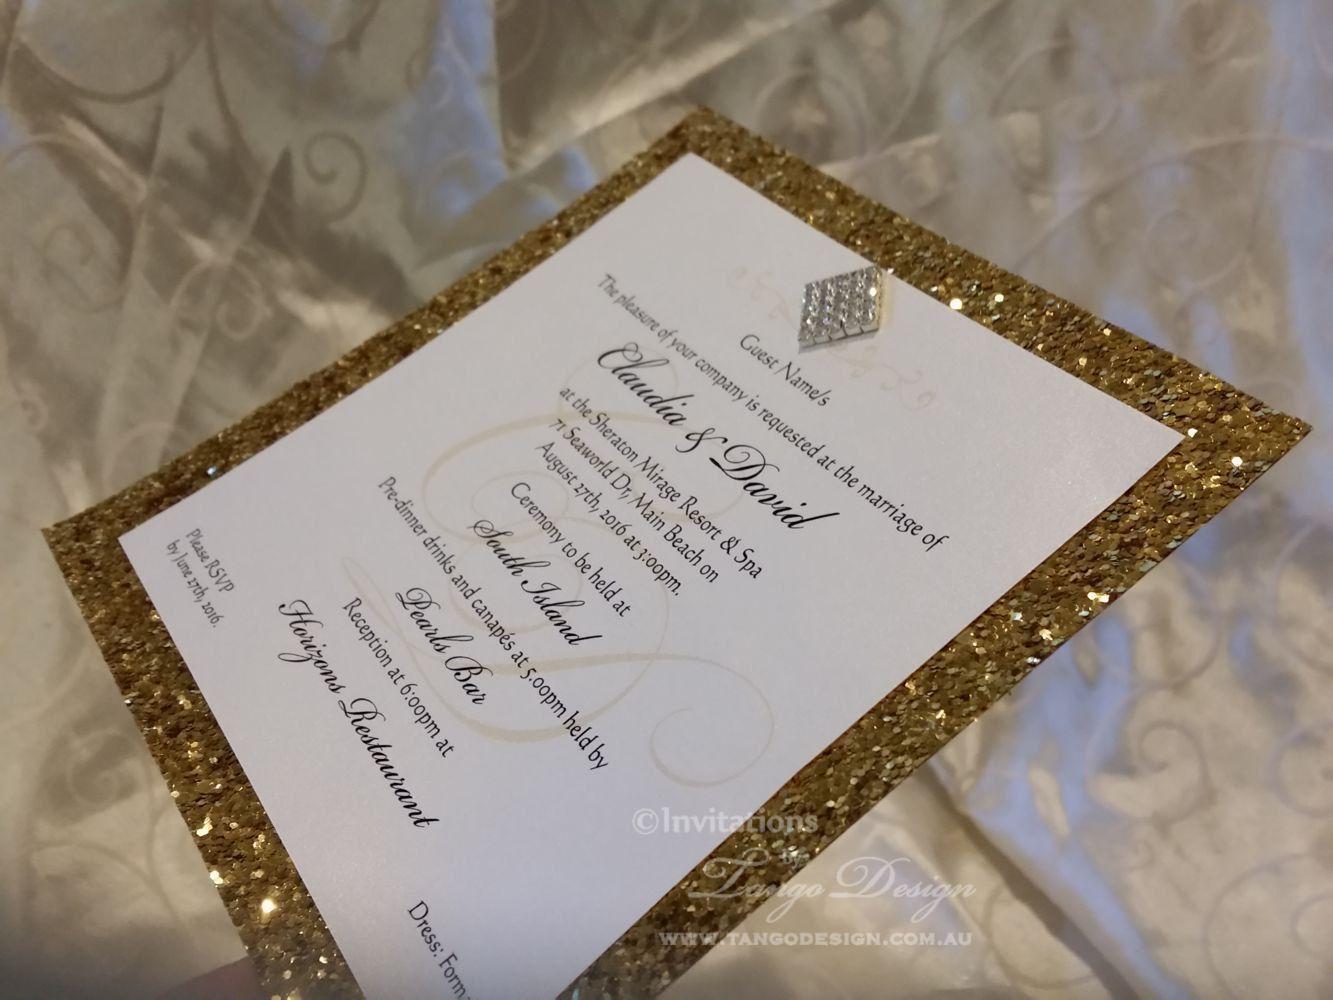 Glitter wedding invitations sparkle wedding or birthday gold glitter glitter wedding invitations sparkle wedding or birthday gold glitter invitation sample shiny invitation golden anniversary metallic invites by stopboris Choice Image